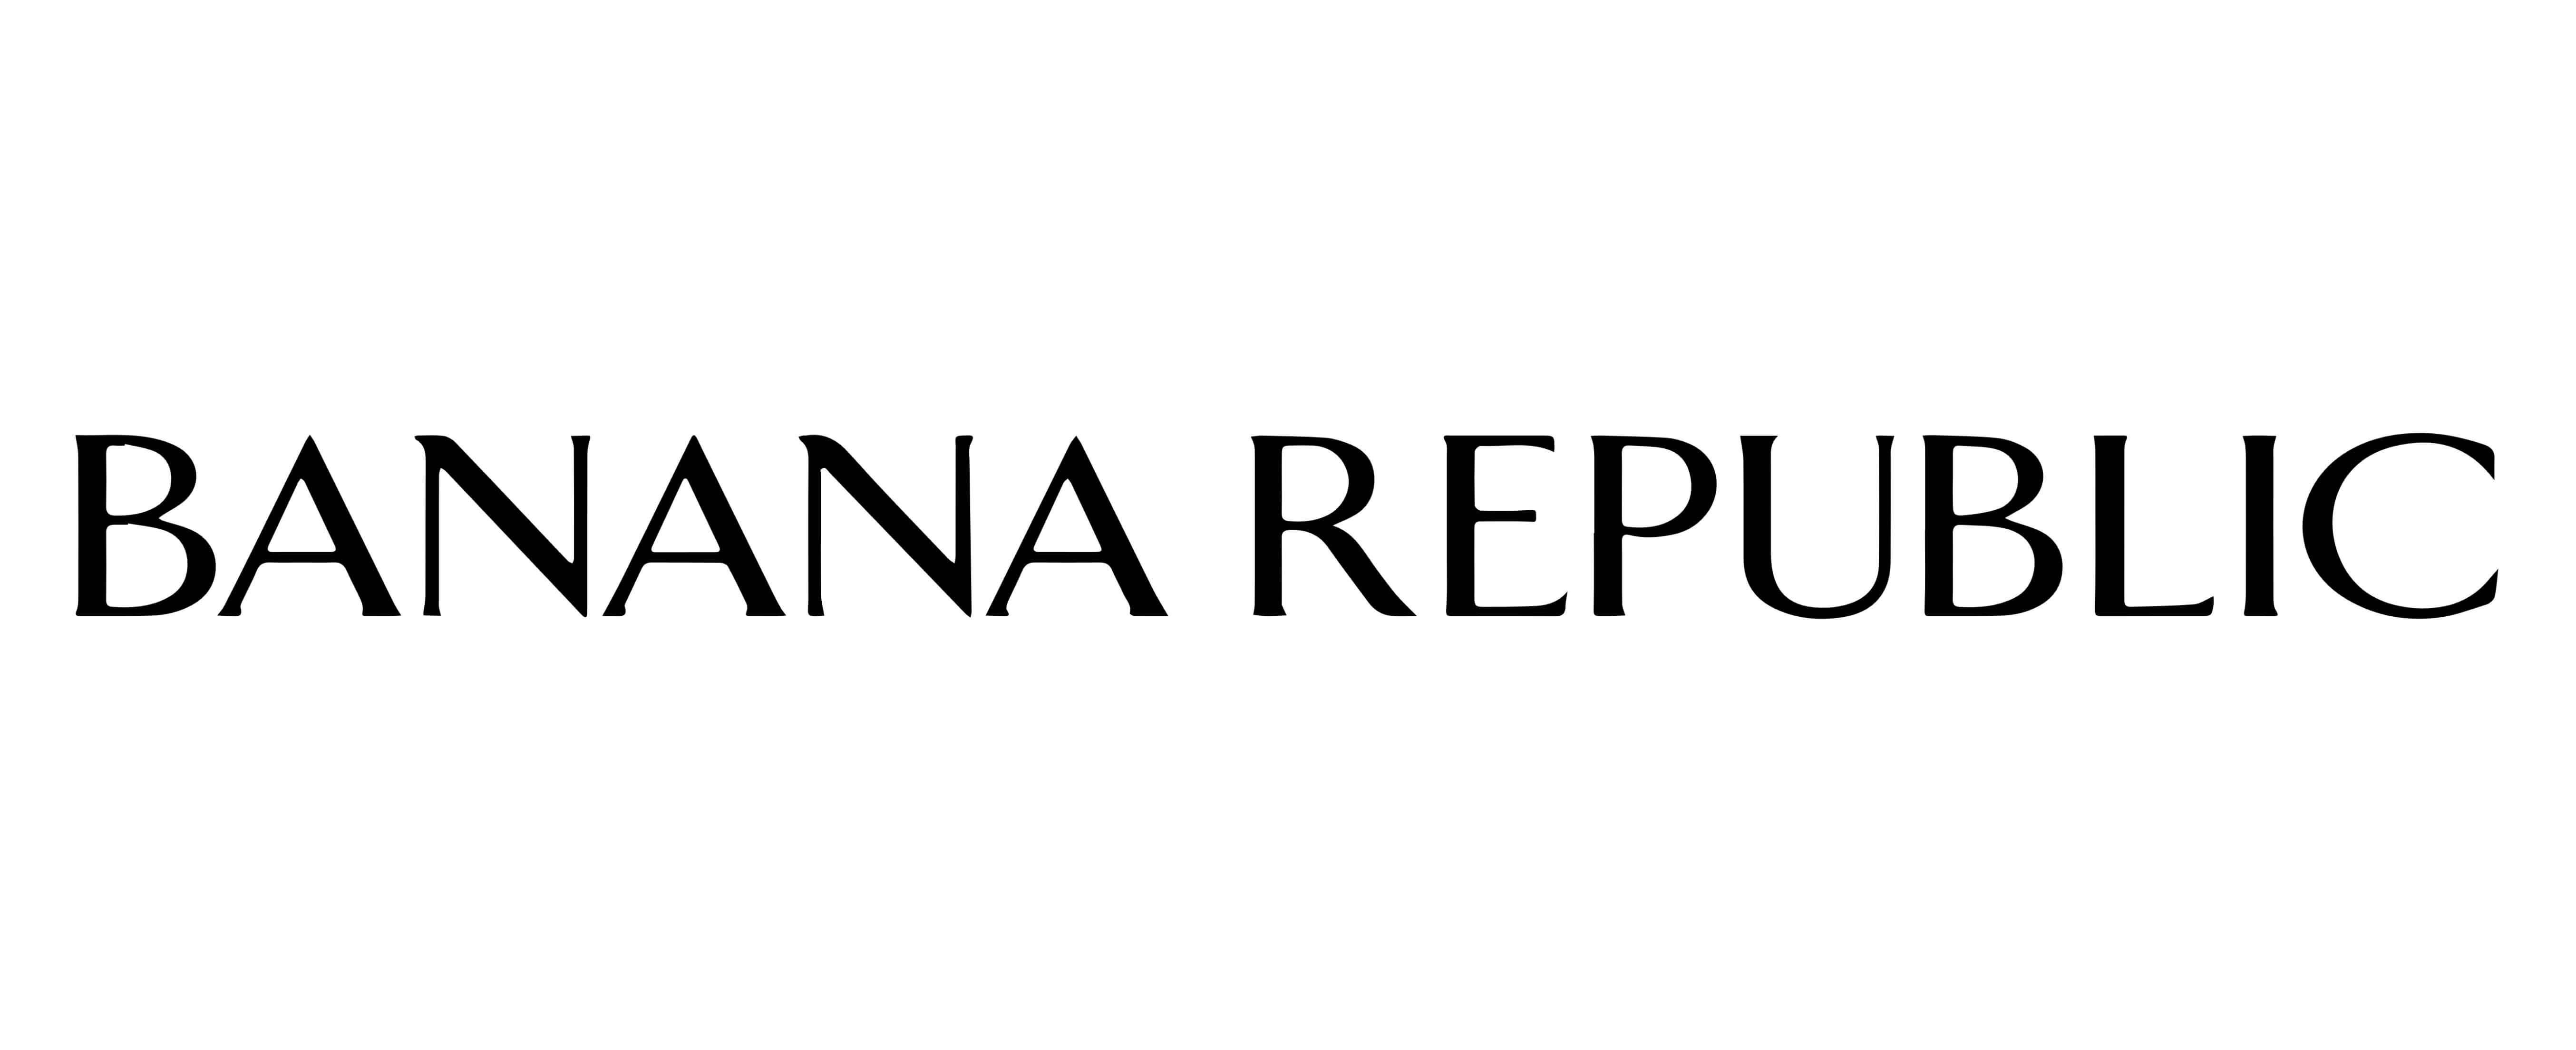 10_bananarepublic